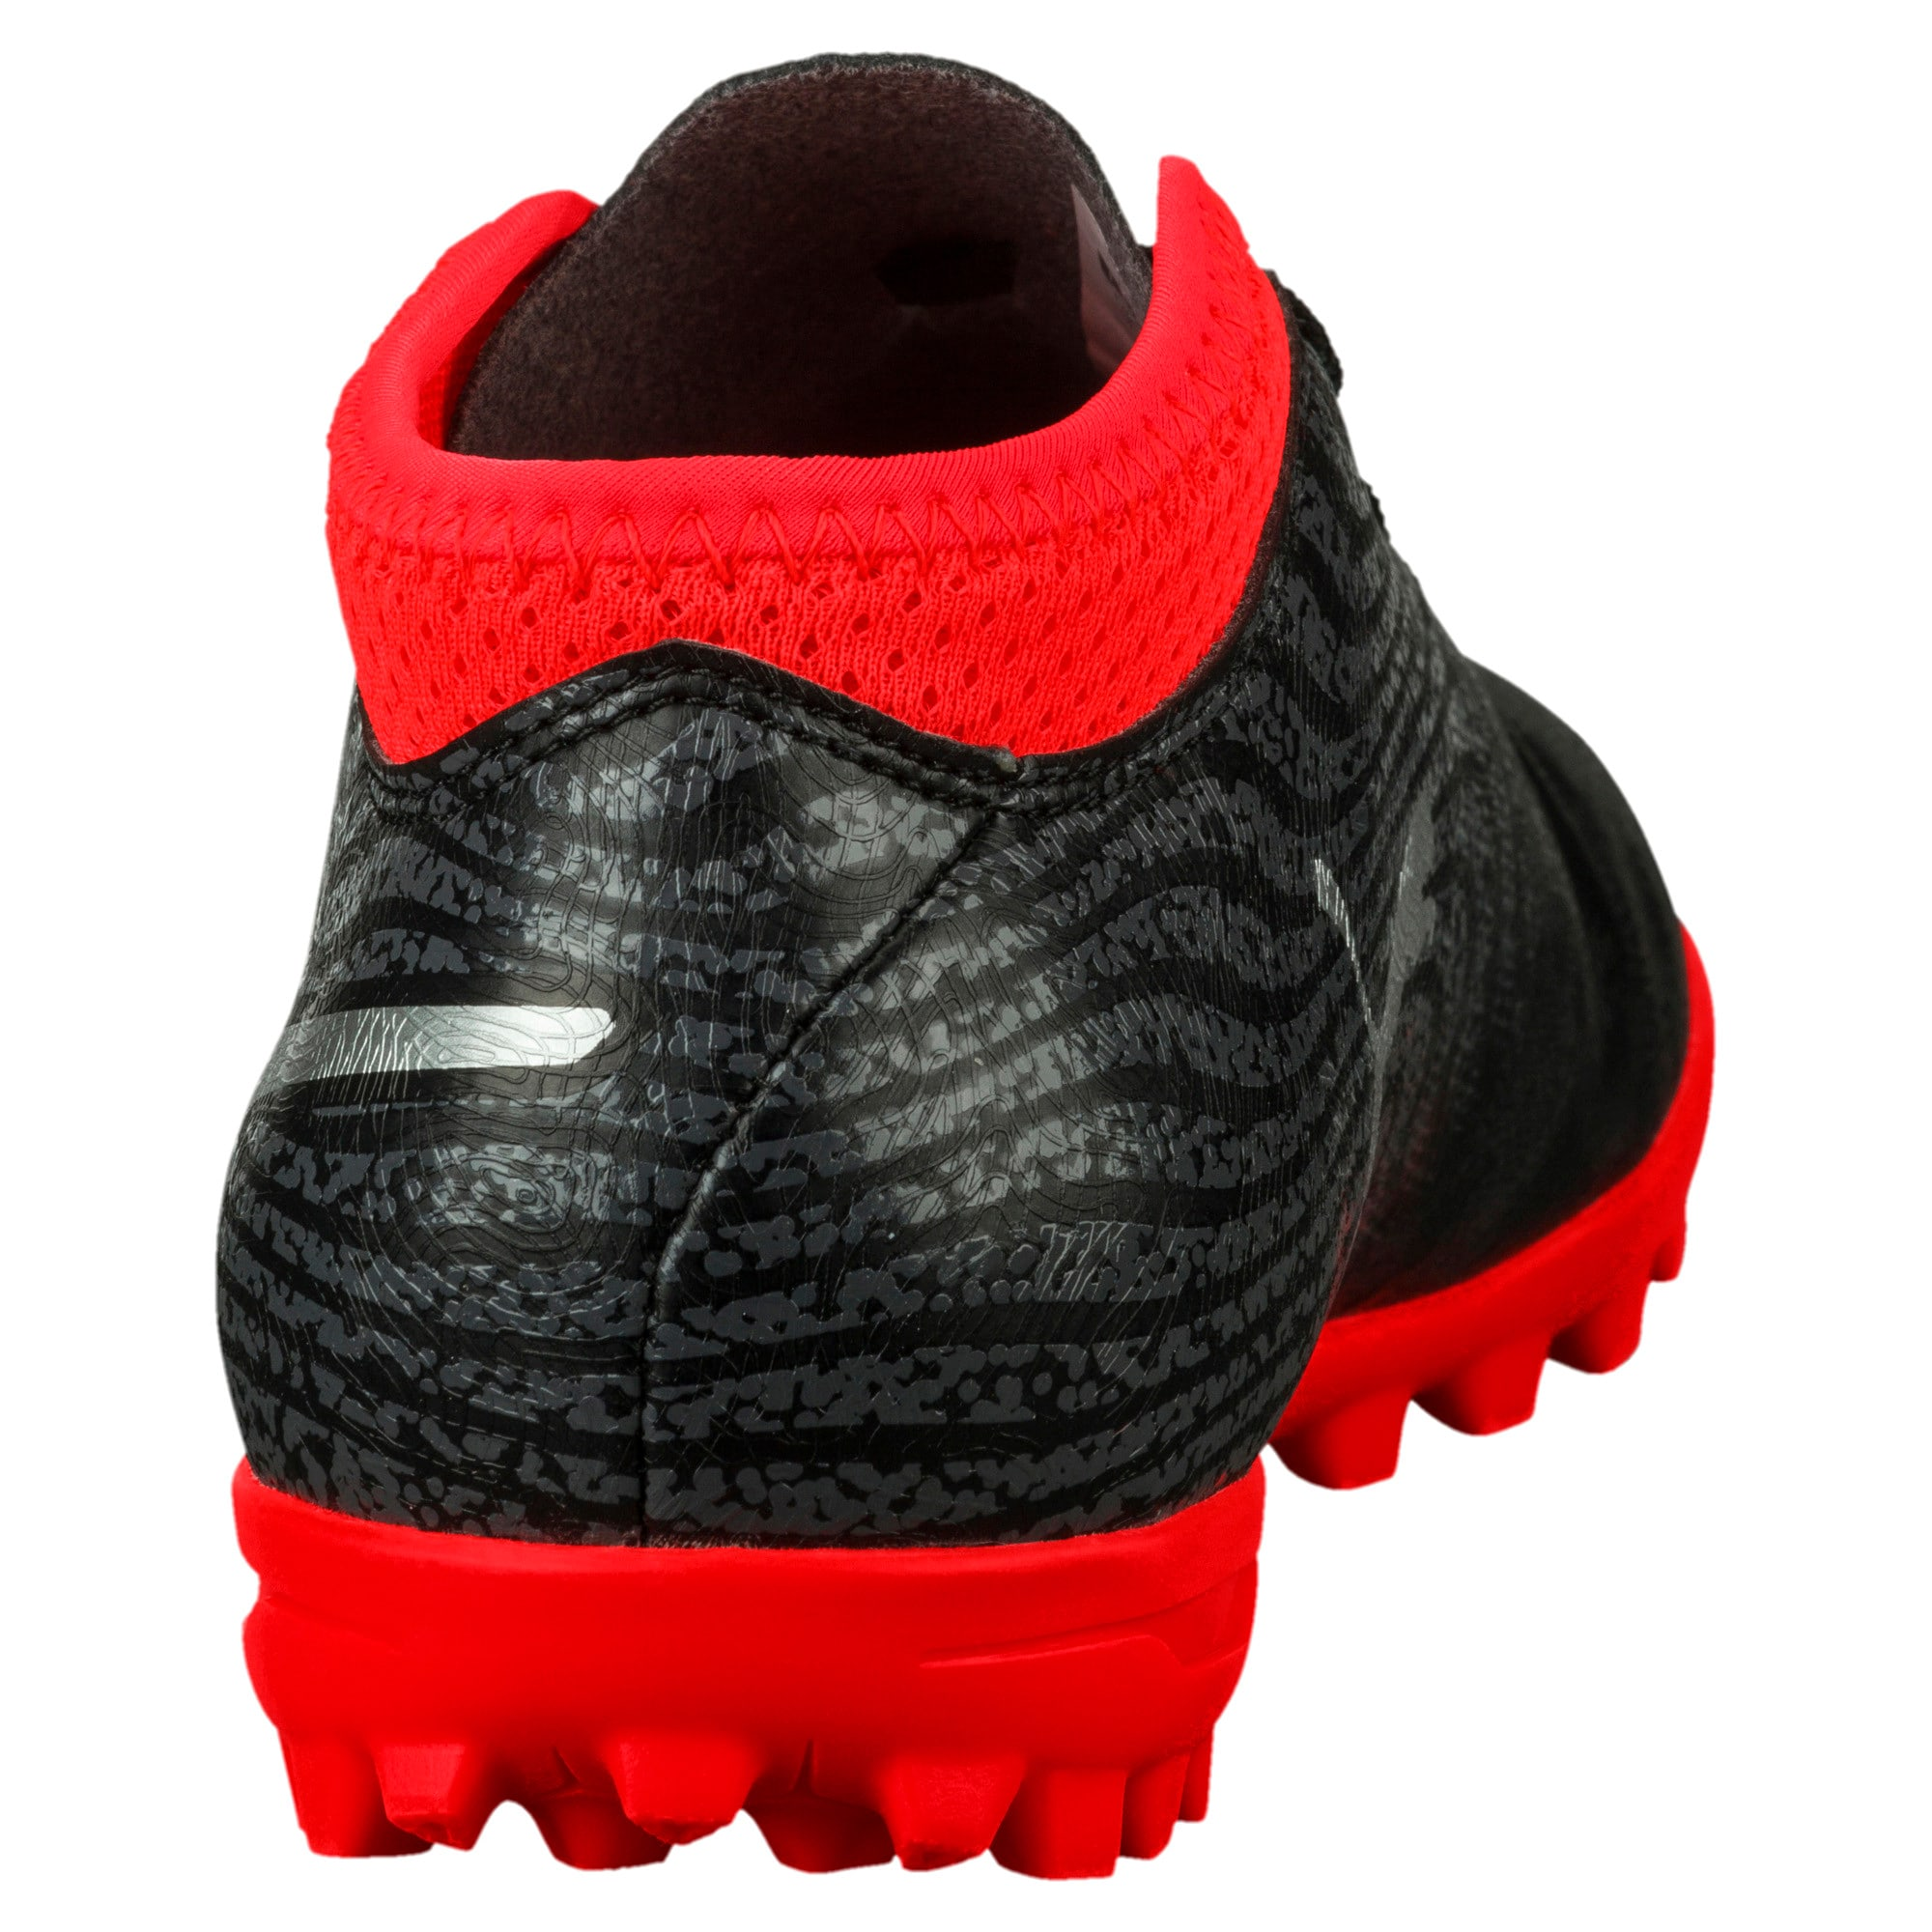 Thumbnail 4 of ONE 18.4 TT Jr Football Boots, Black-Silver-Red, medium-IND